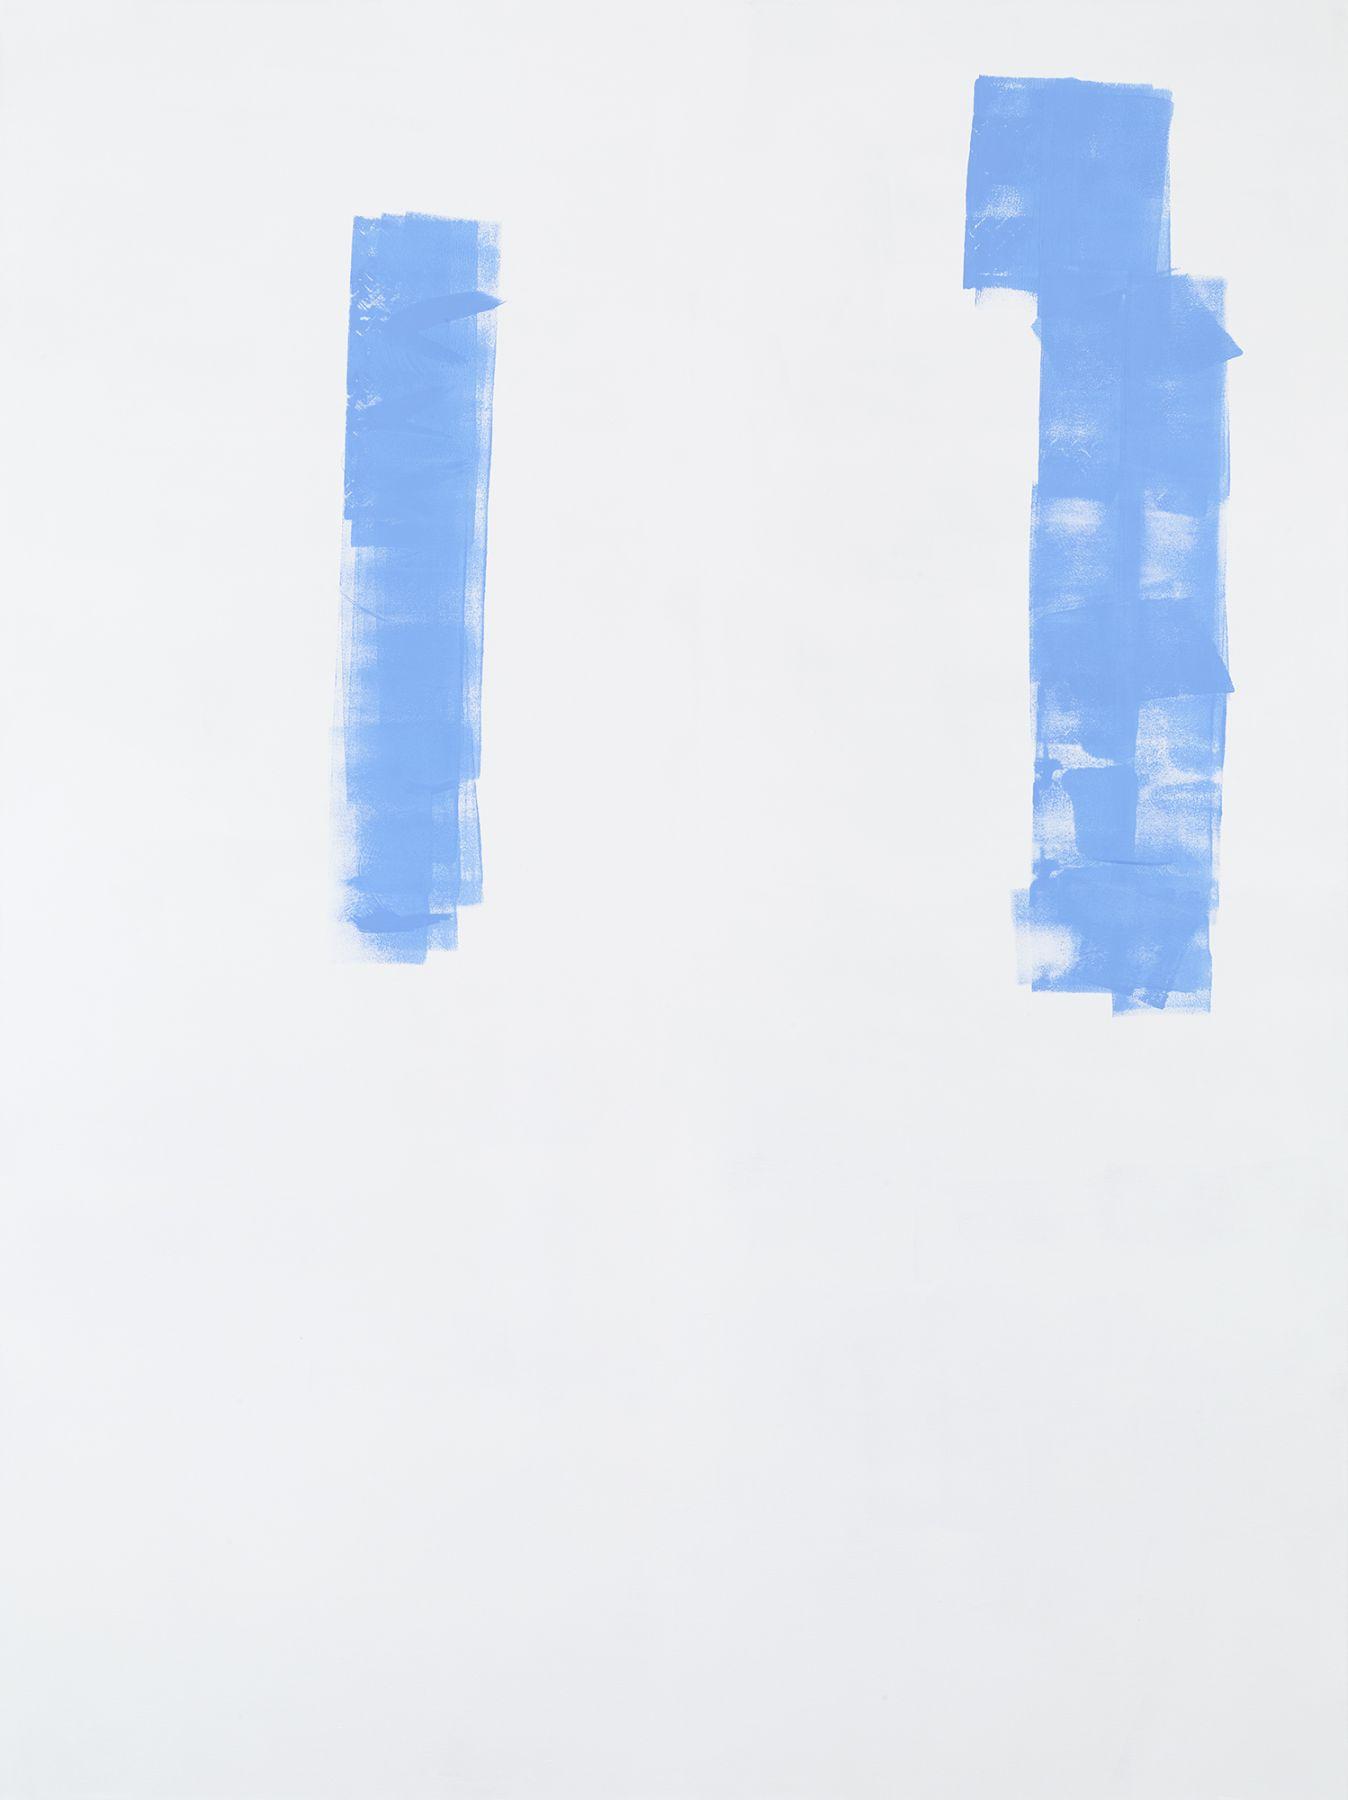 Michael Krebber MK.304, 2015 Acrylic on canvas  78 3/4 x 59 1/8 inches (200 x 150.2 cm)